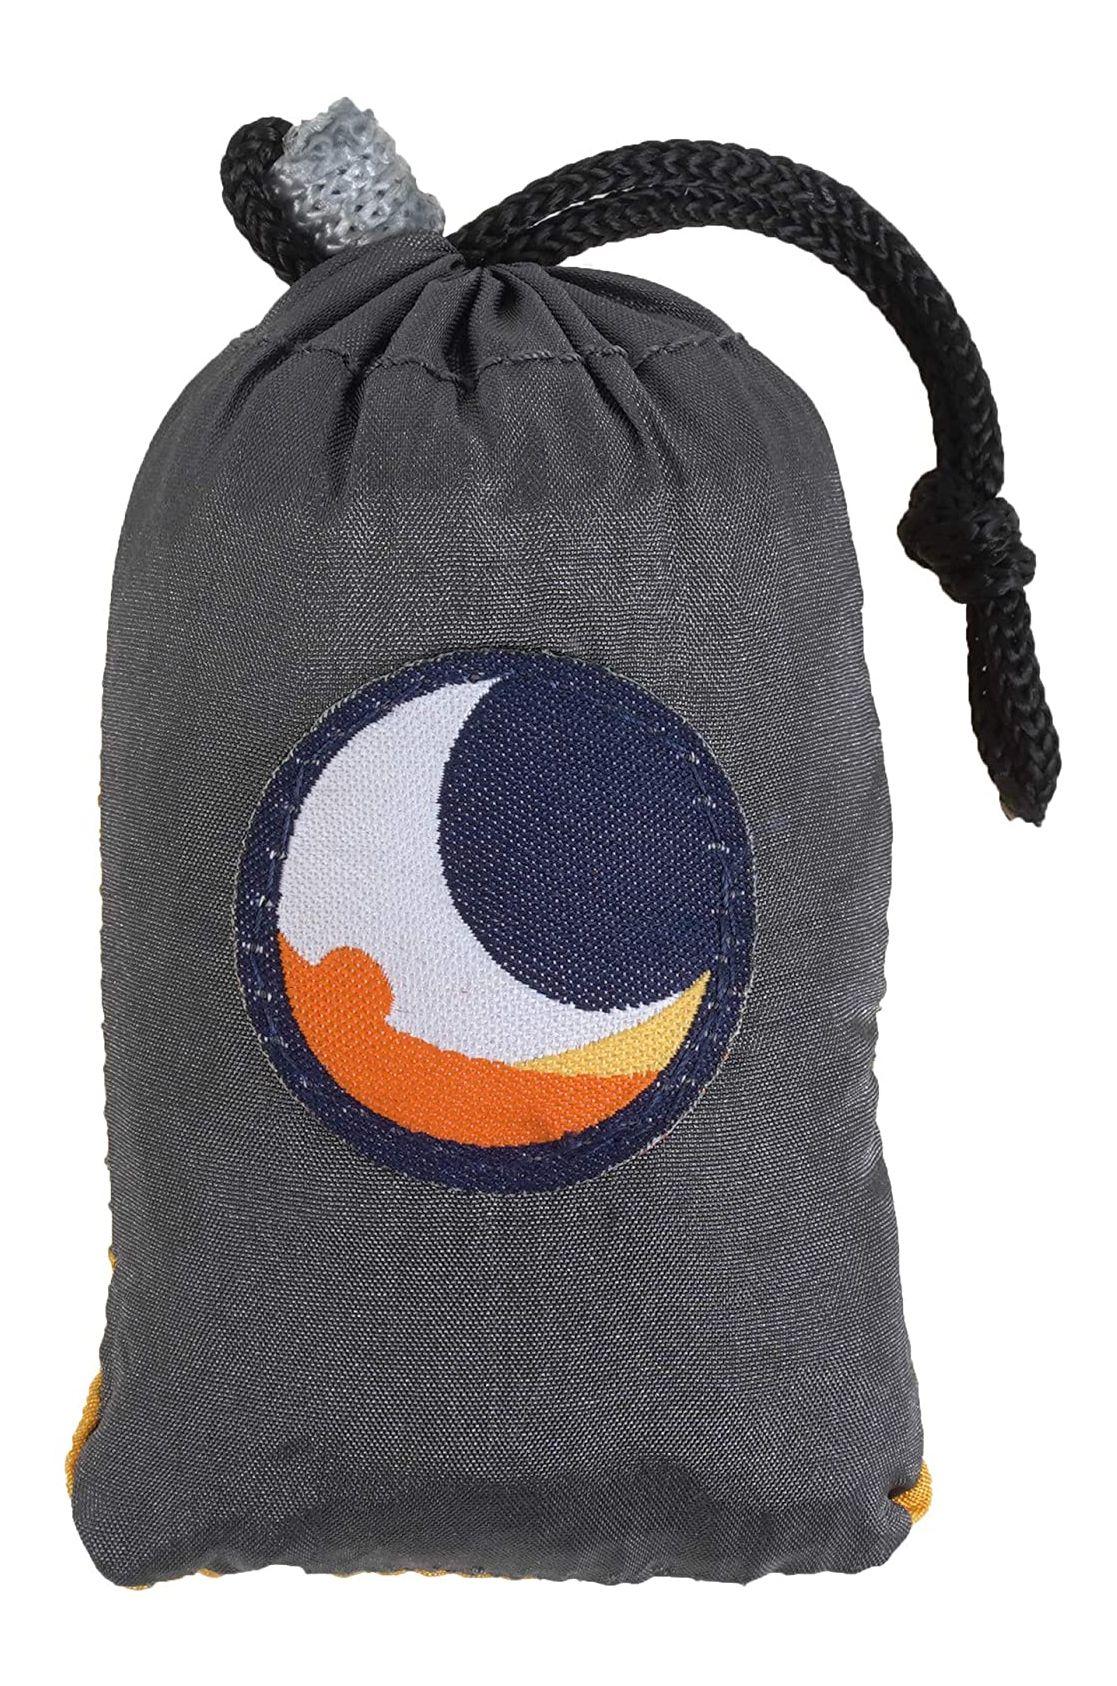 Ticket To The Moon Bag ECO BAG SMALL Dark Grey/Dark Yellow